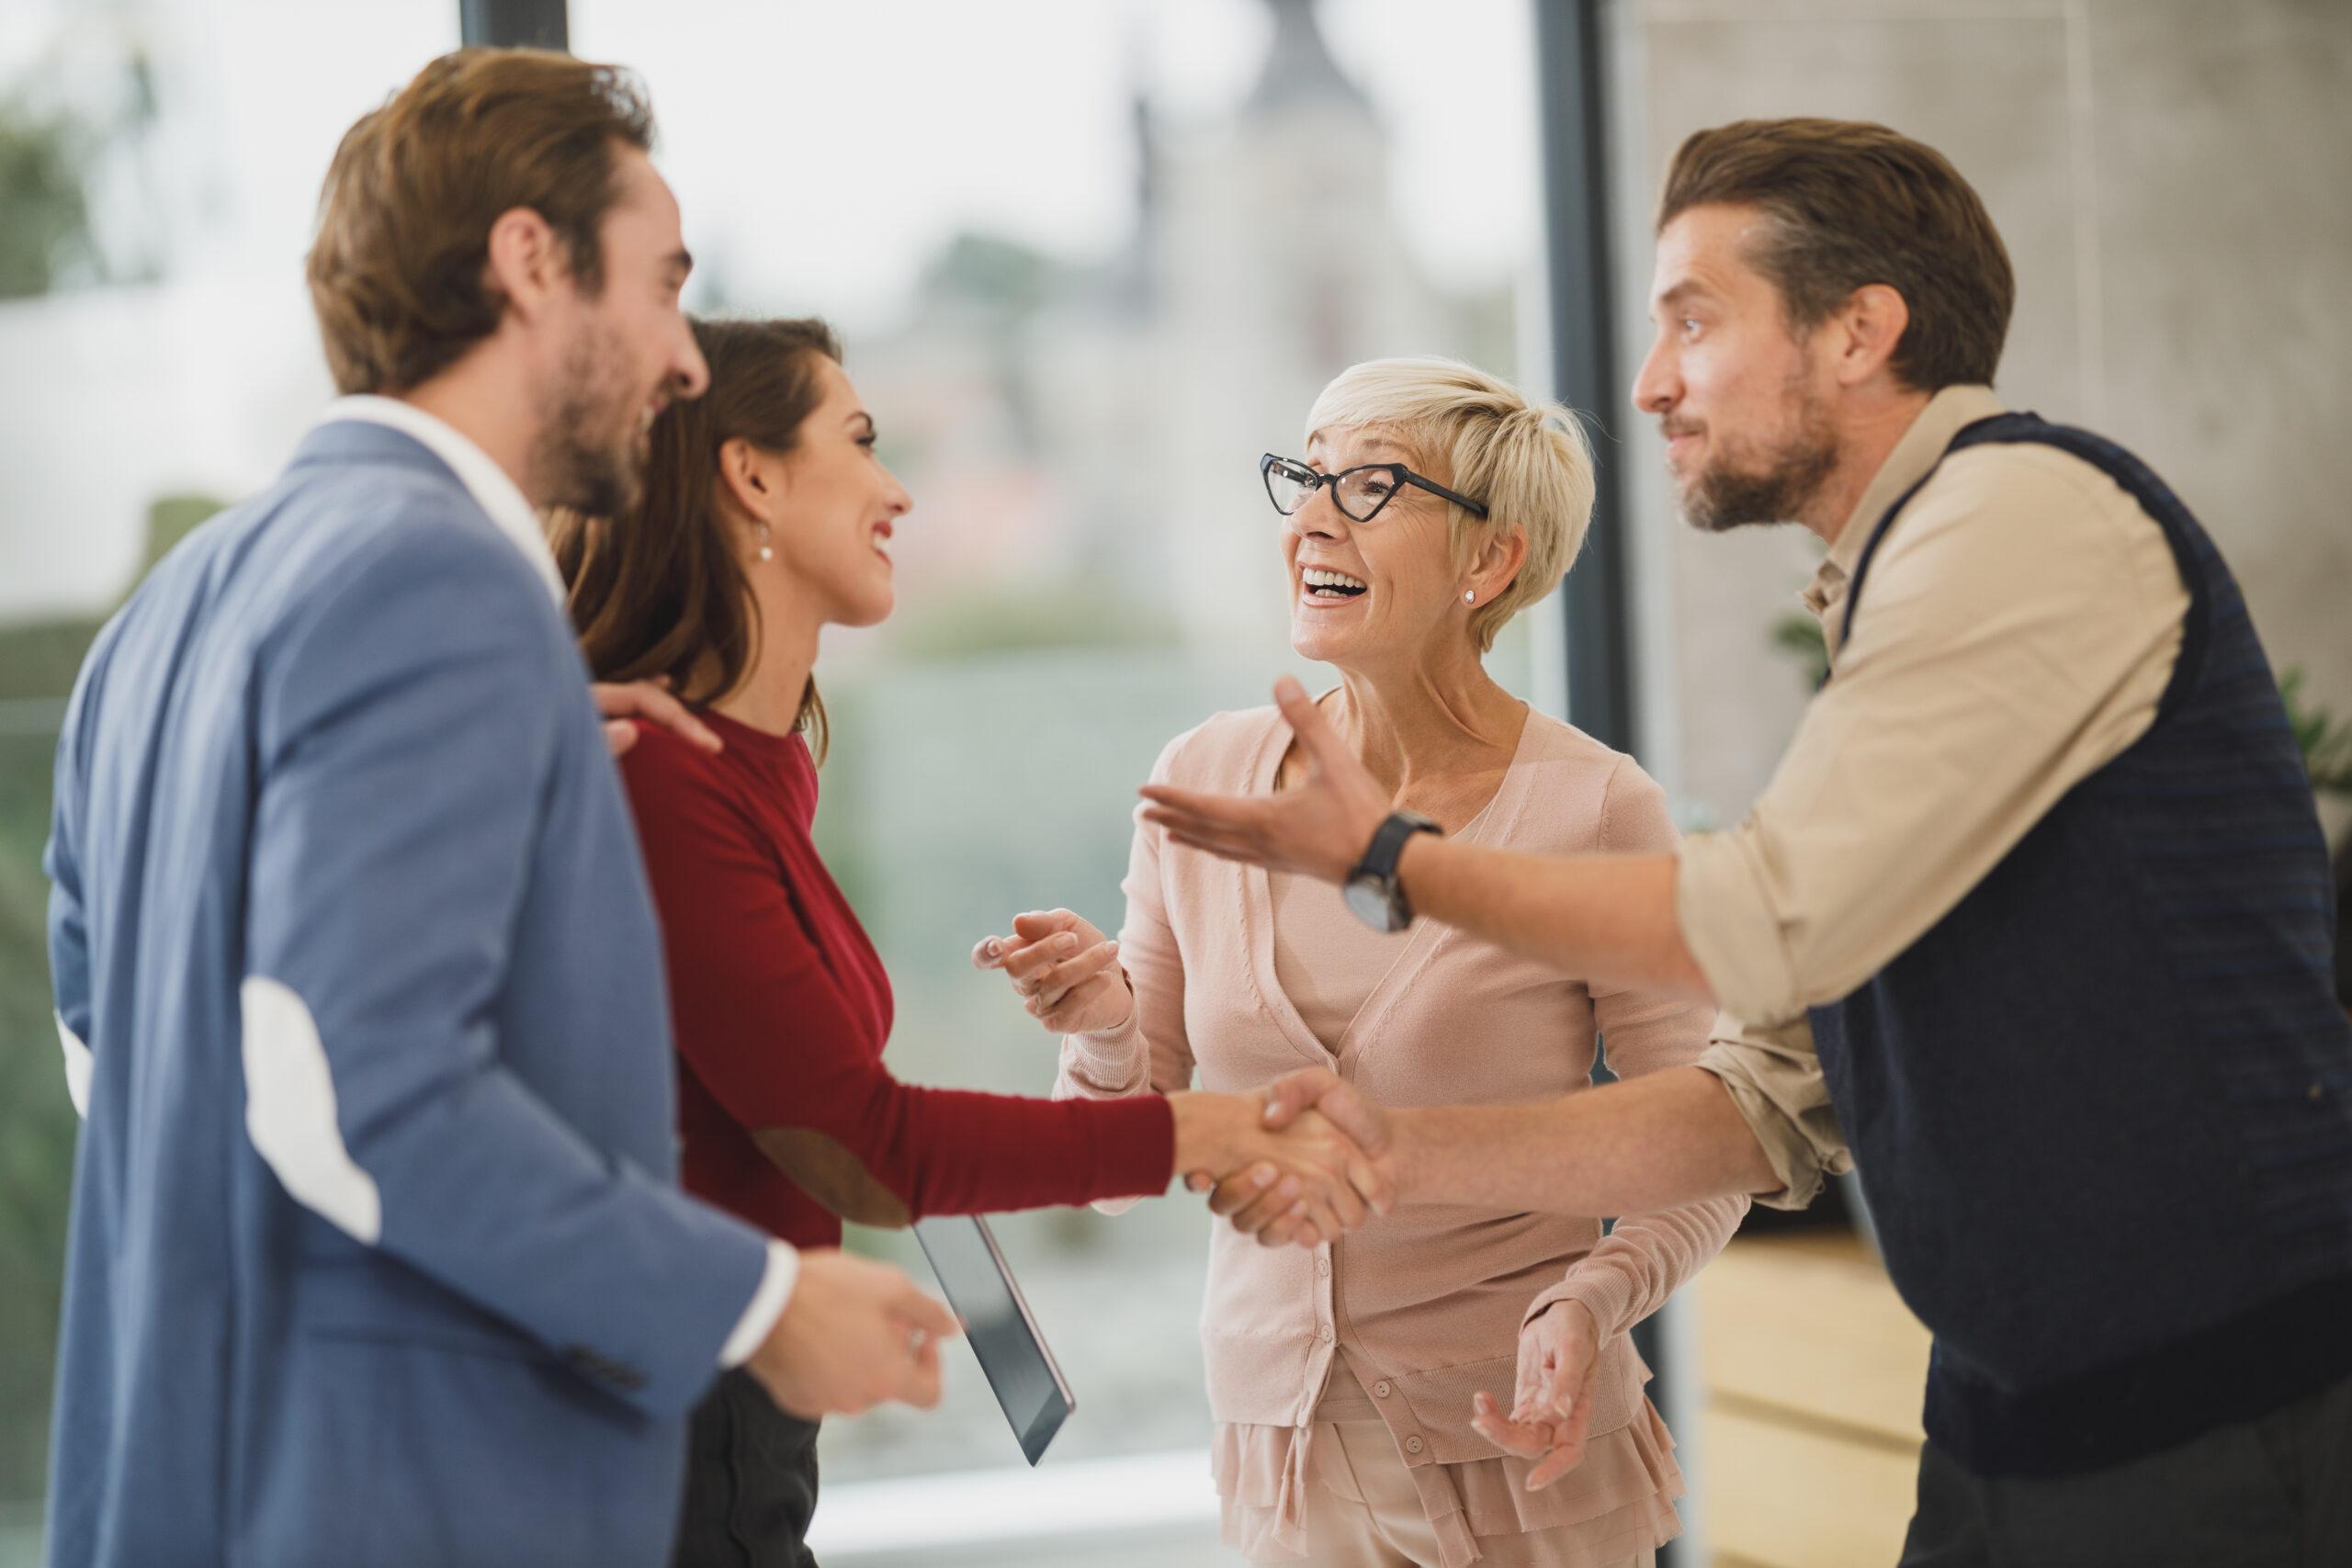 teamwork and communication